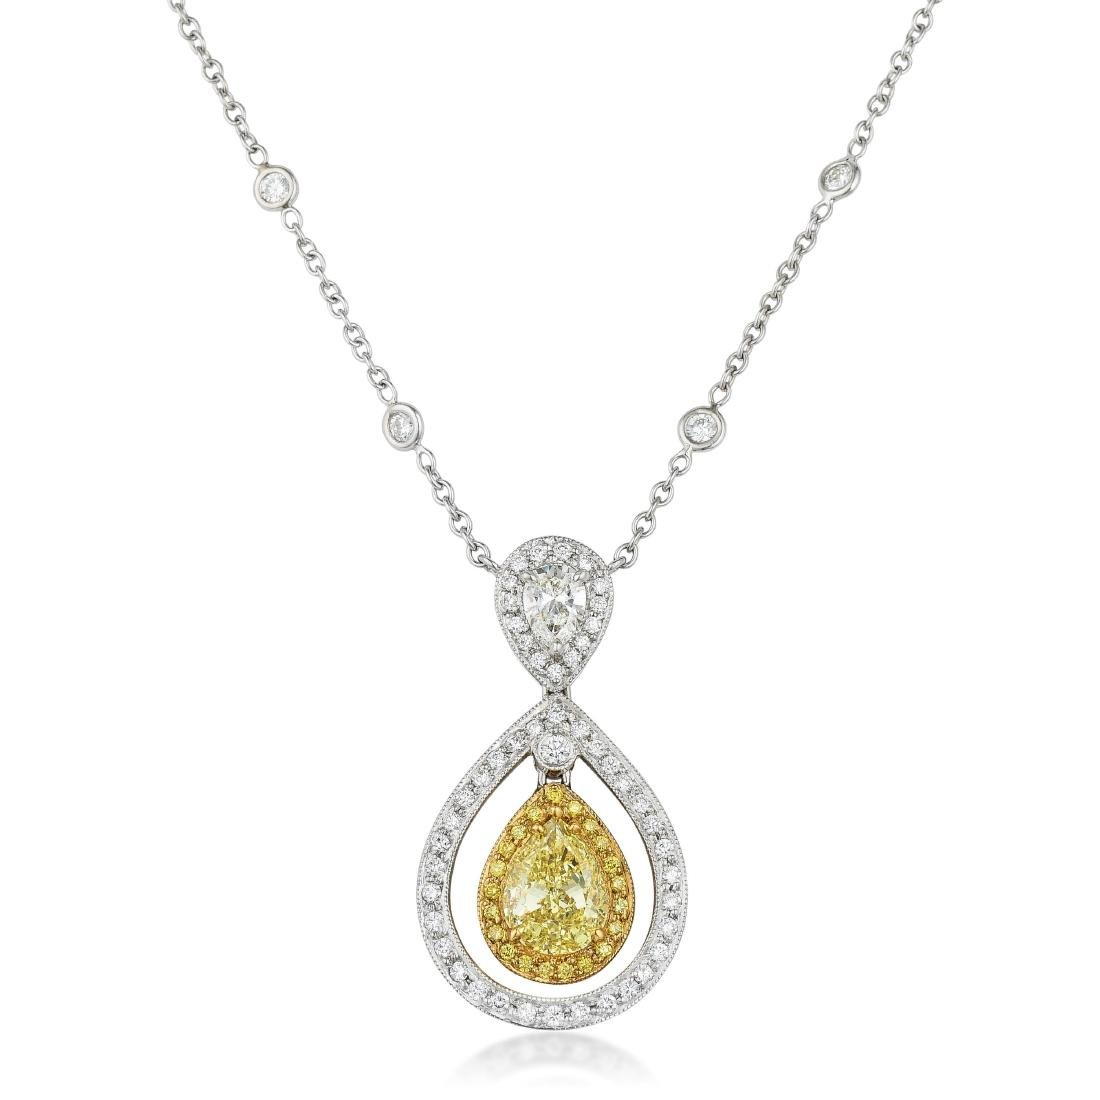 A Fancy Yellow Diamond and Diamond Pendant Necklace